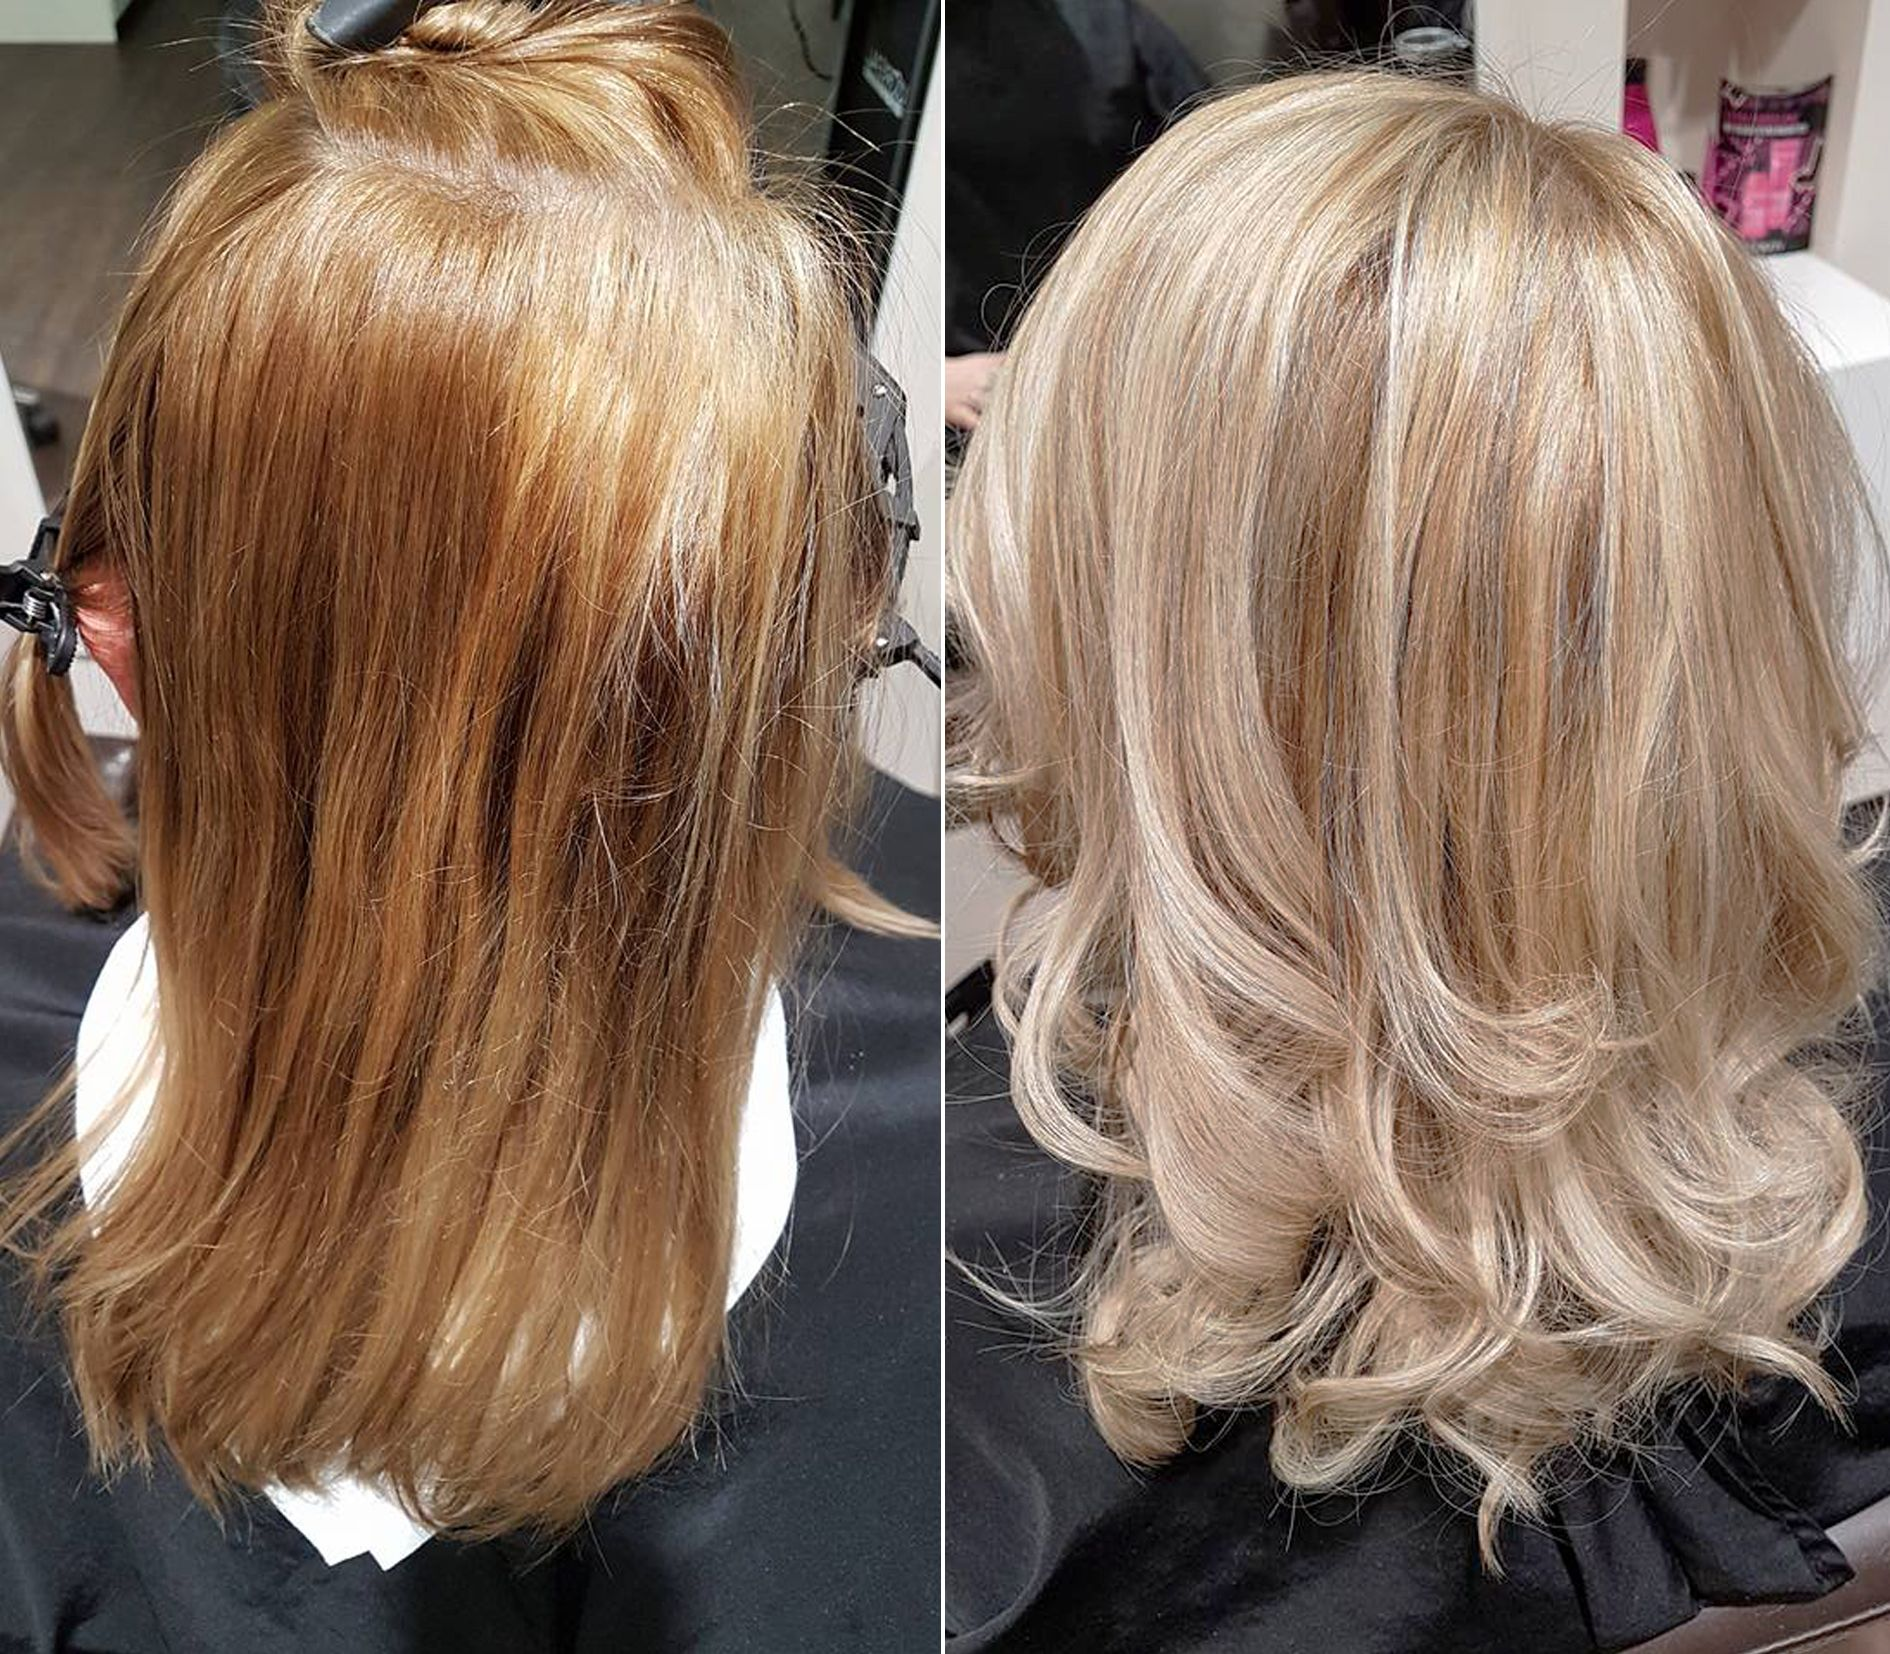 Frisuren Vorher Nachher Blond Experte Friseur D Machts Lounge